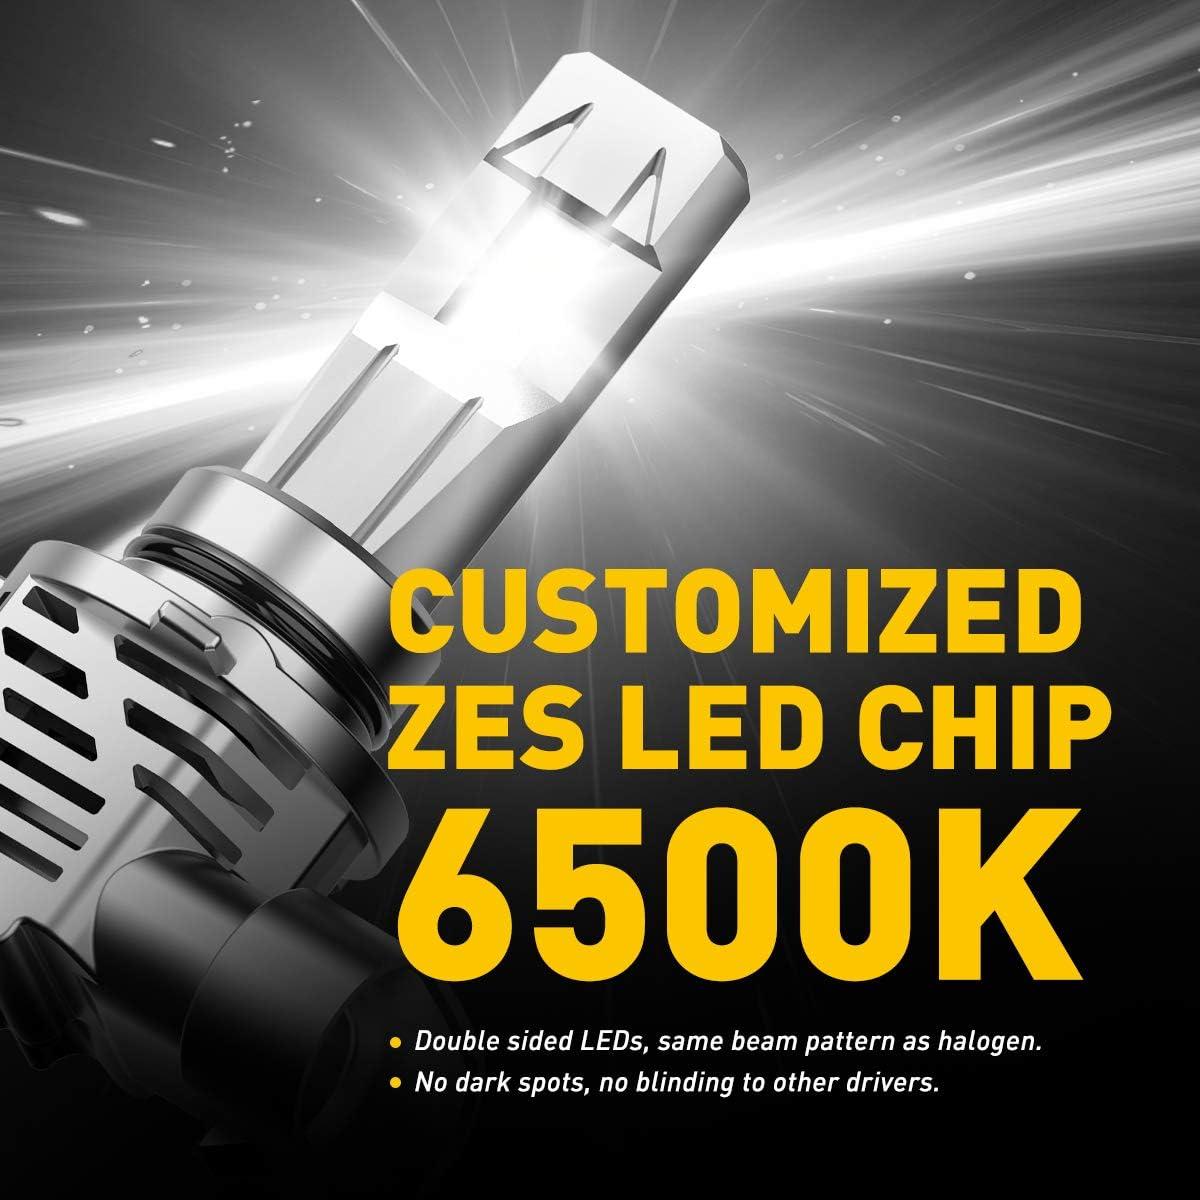 AUXITO 9006 LED Headlight Bulbs 12000LM Per Set 6500K Xenon White Mini Size HB4 Wireless Headlight Pack of 2